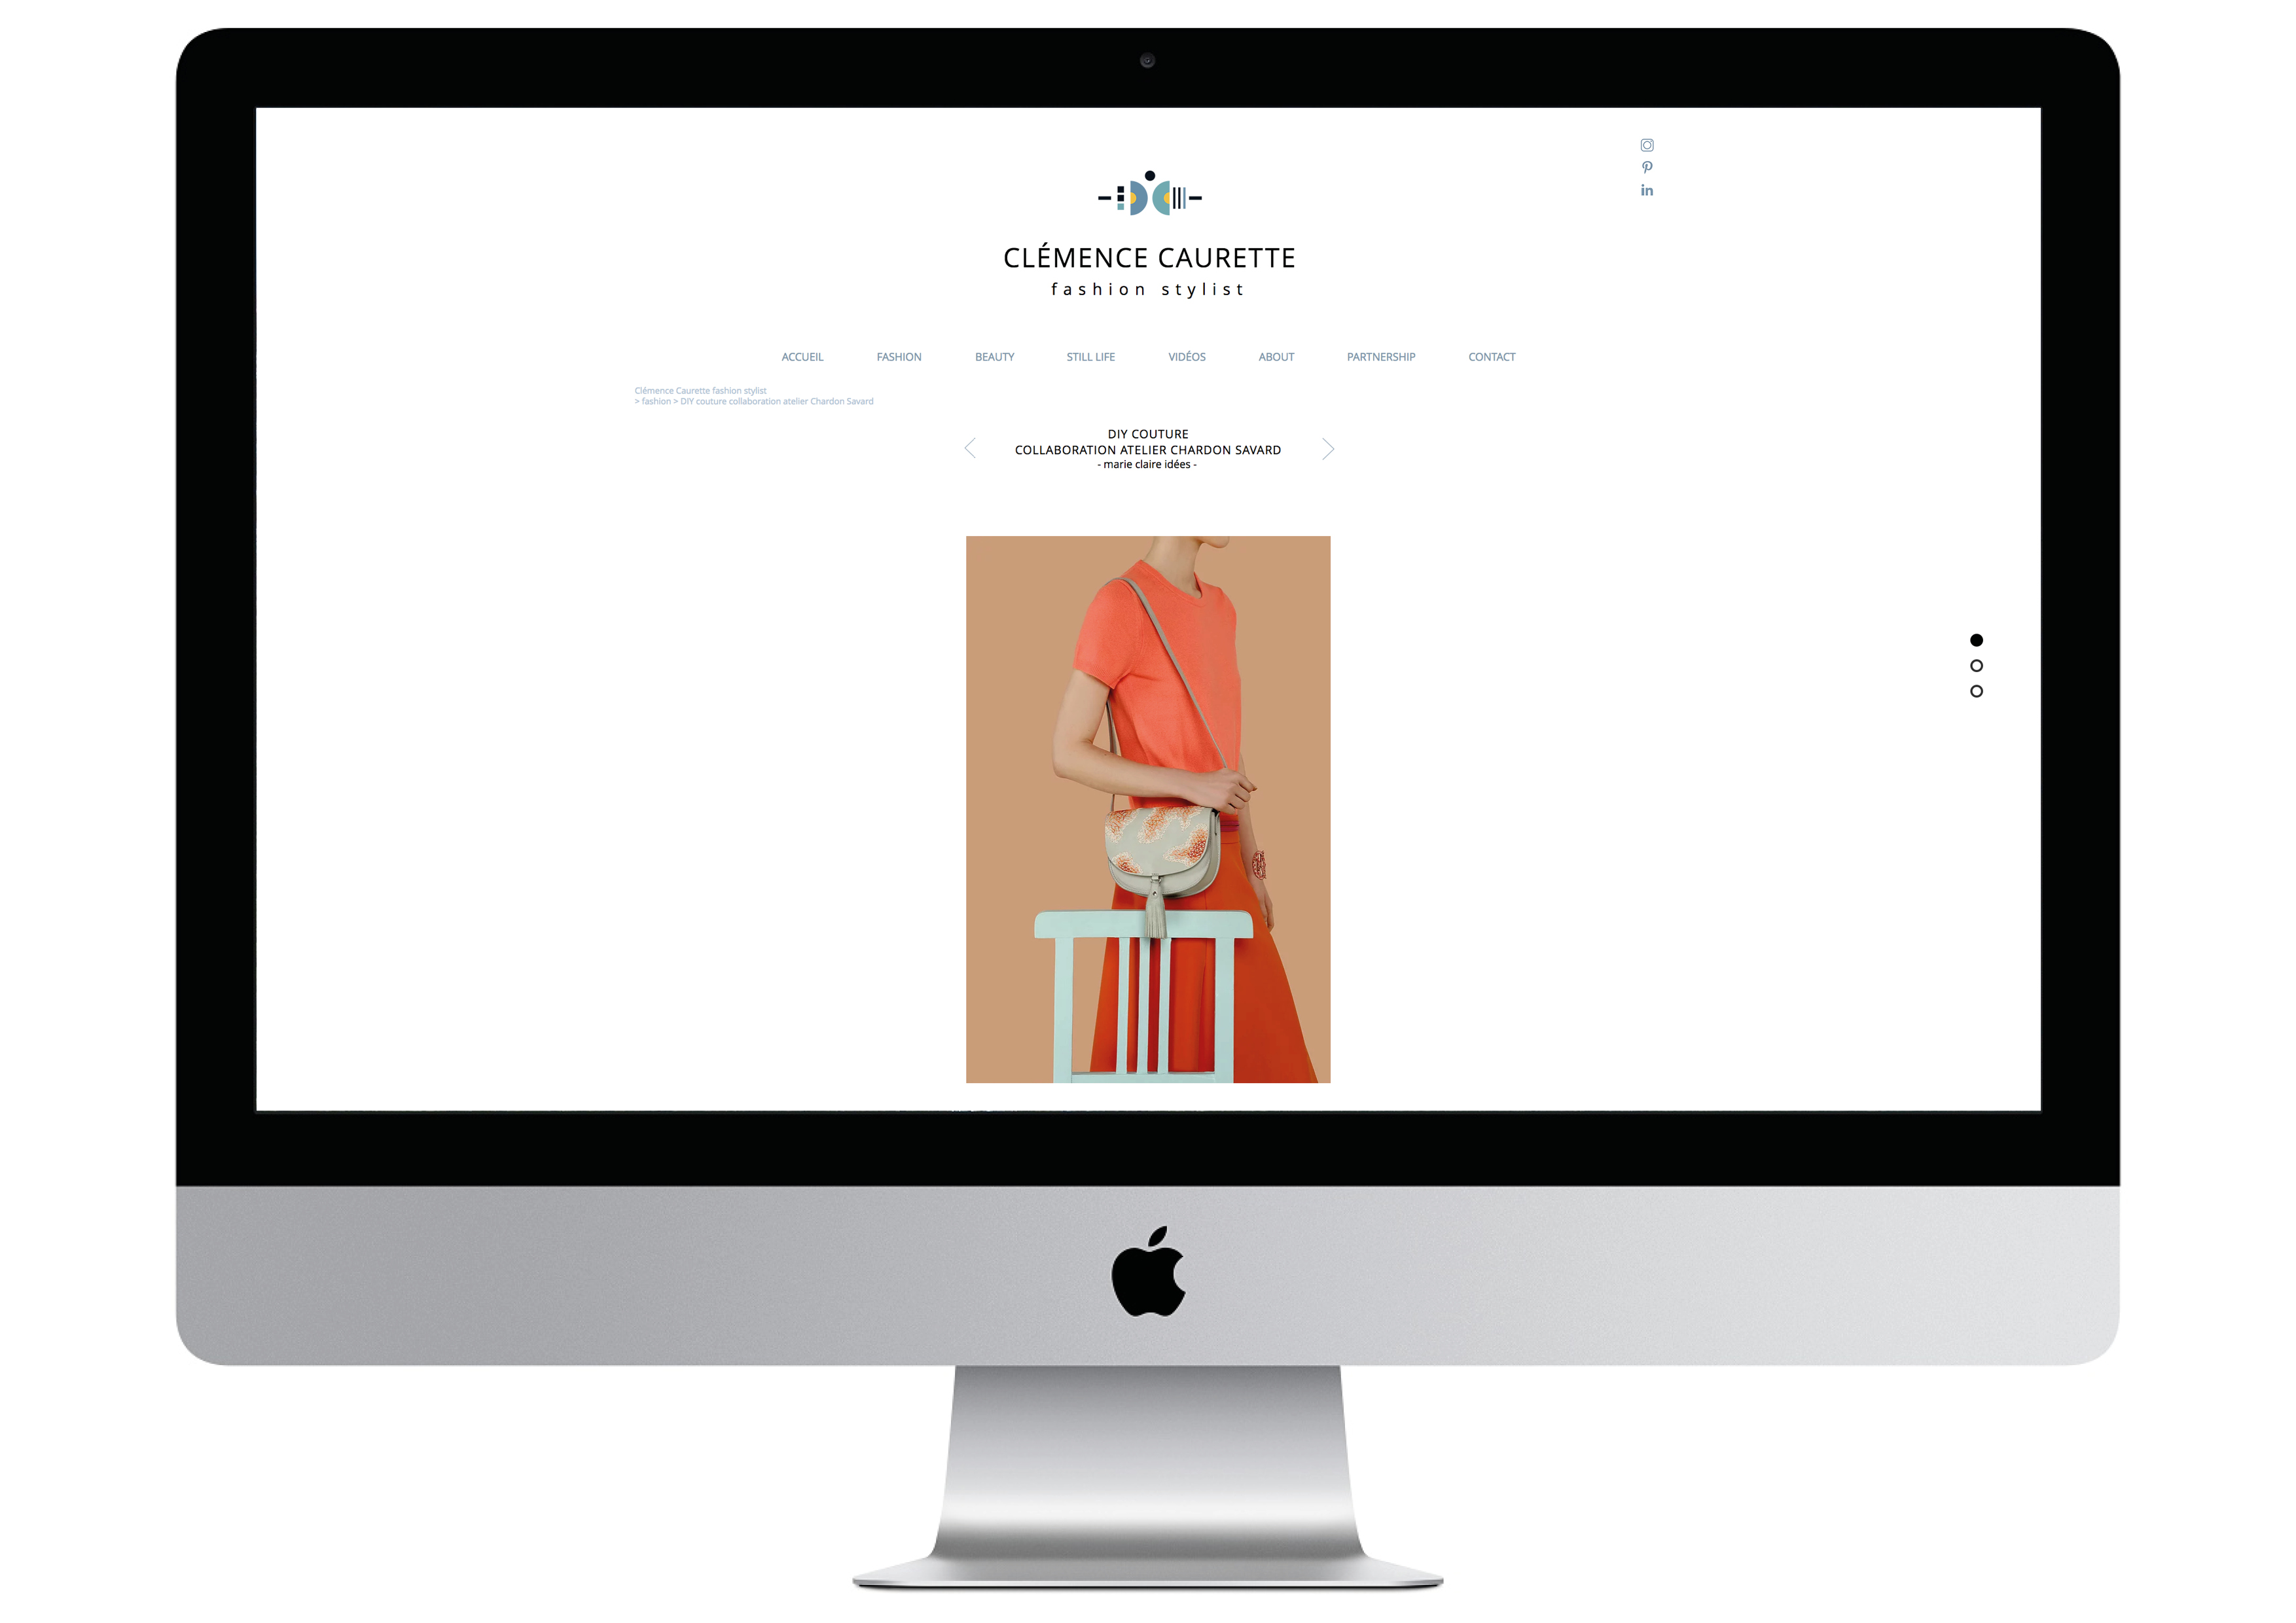 hortense-rossignol-graphisme11.jpg